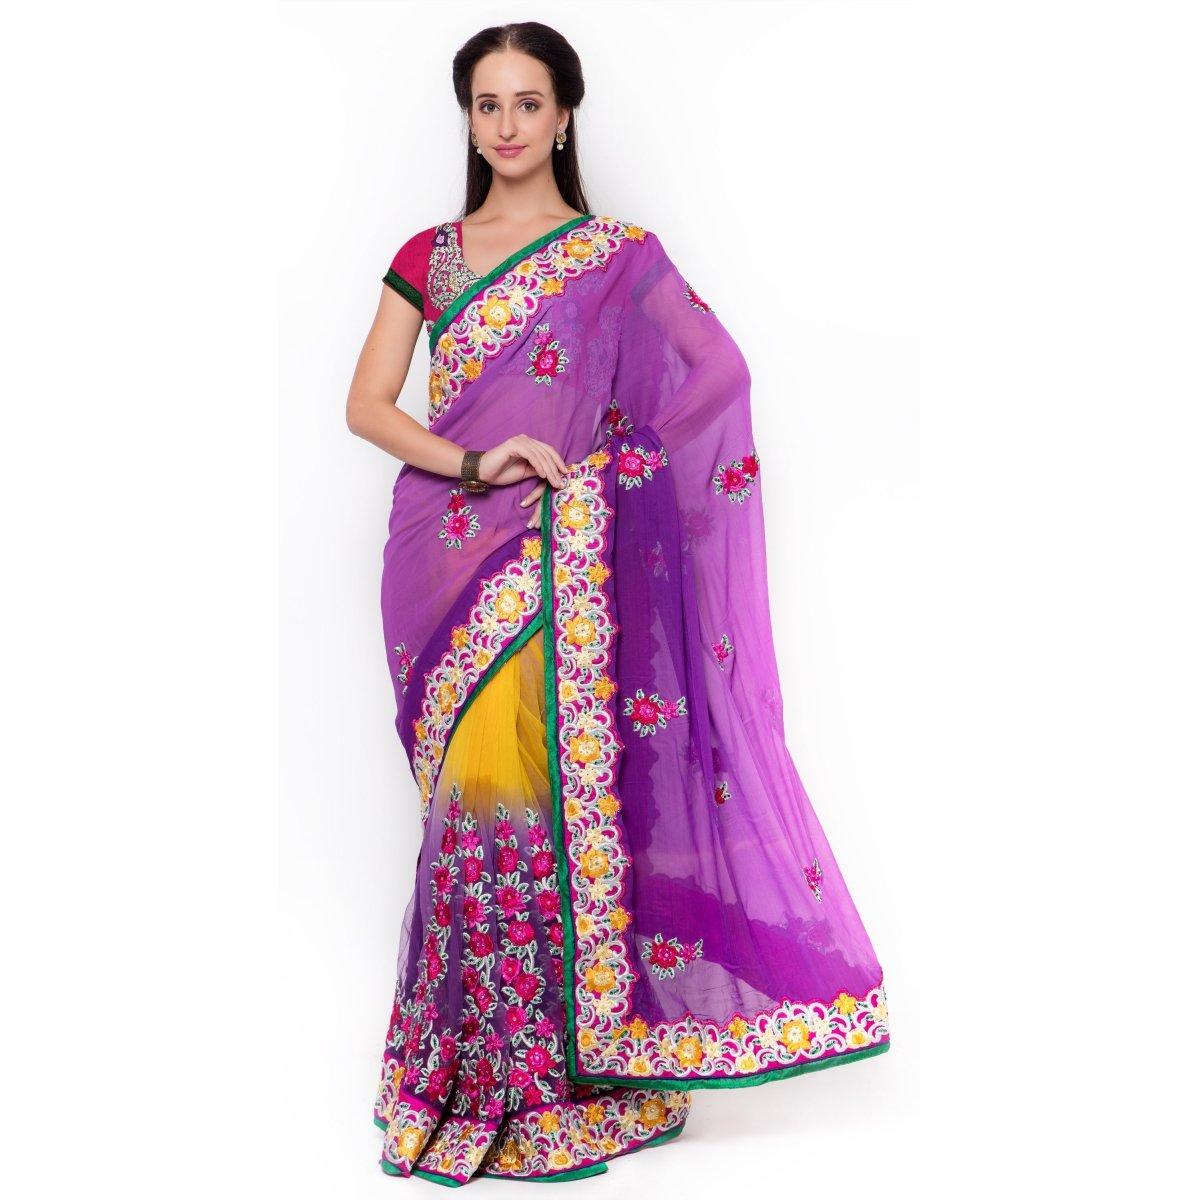 Triveni Women's Indian Purple Synthetic Embroidered Saree , Sari